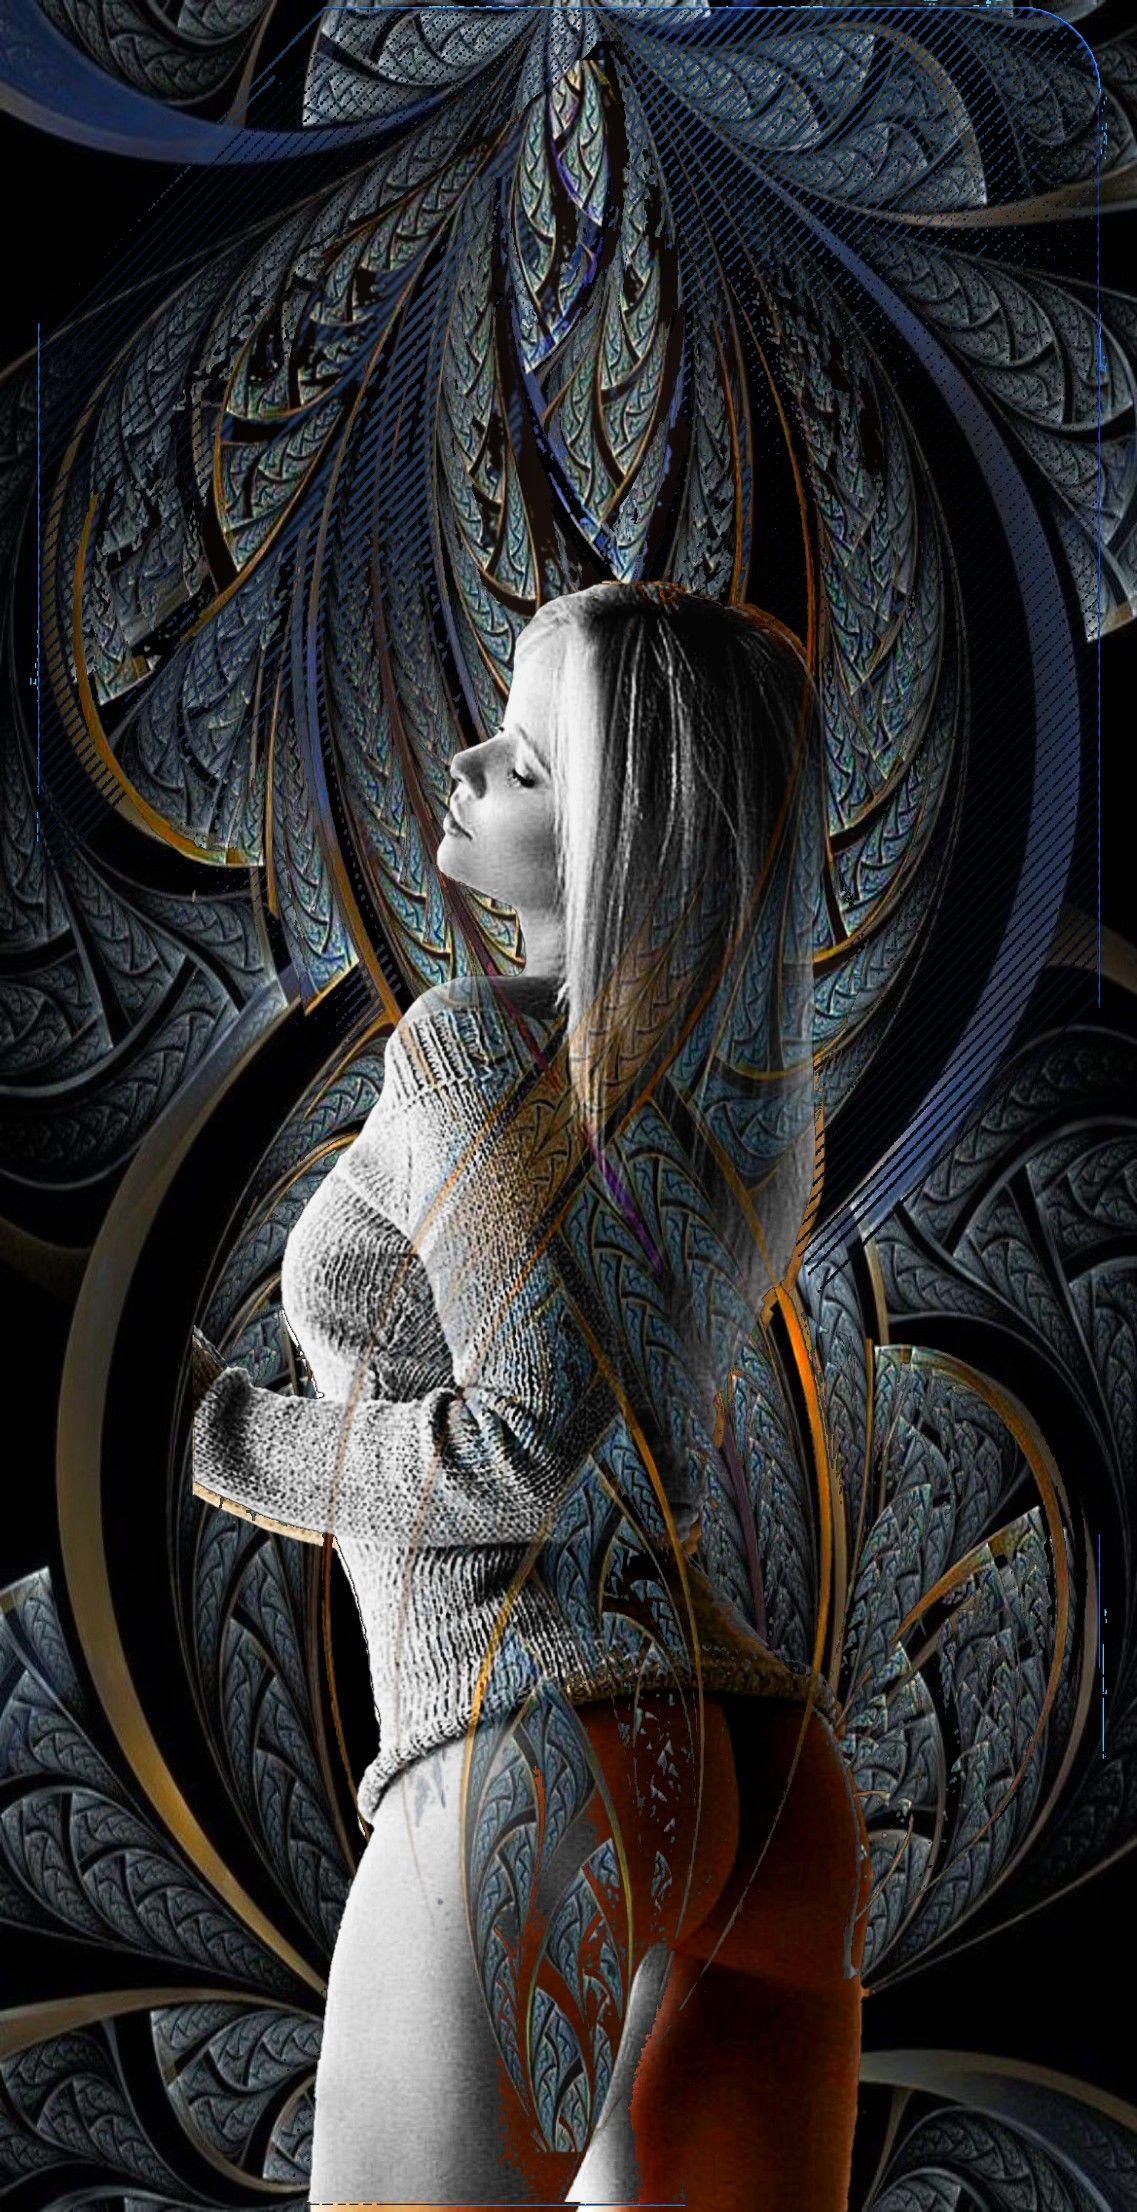 Watercolors image by Mitch Cumberworth Dark fantasy art